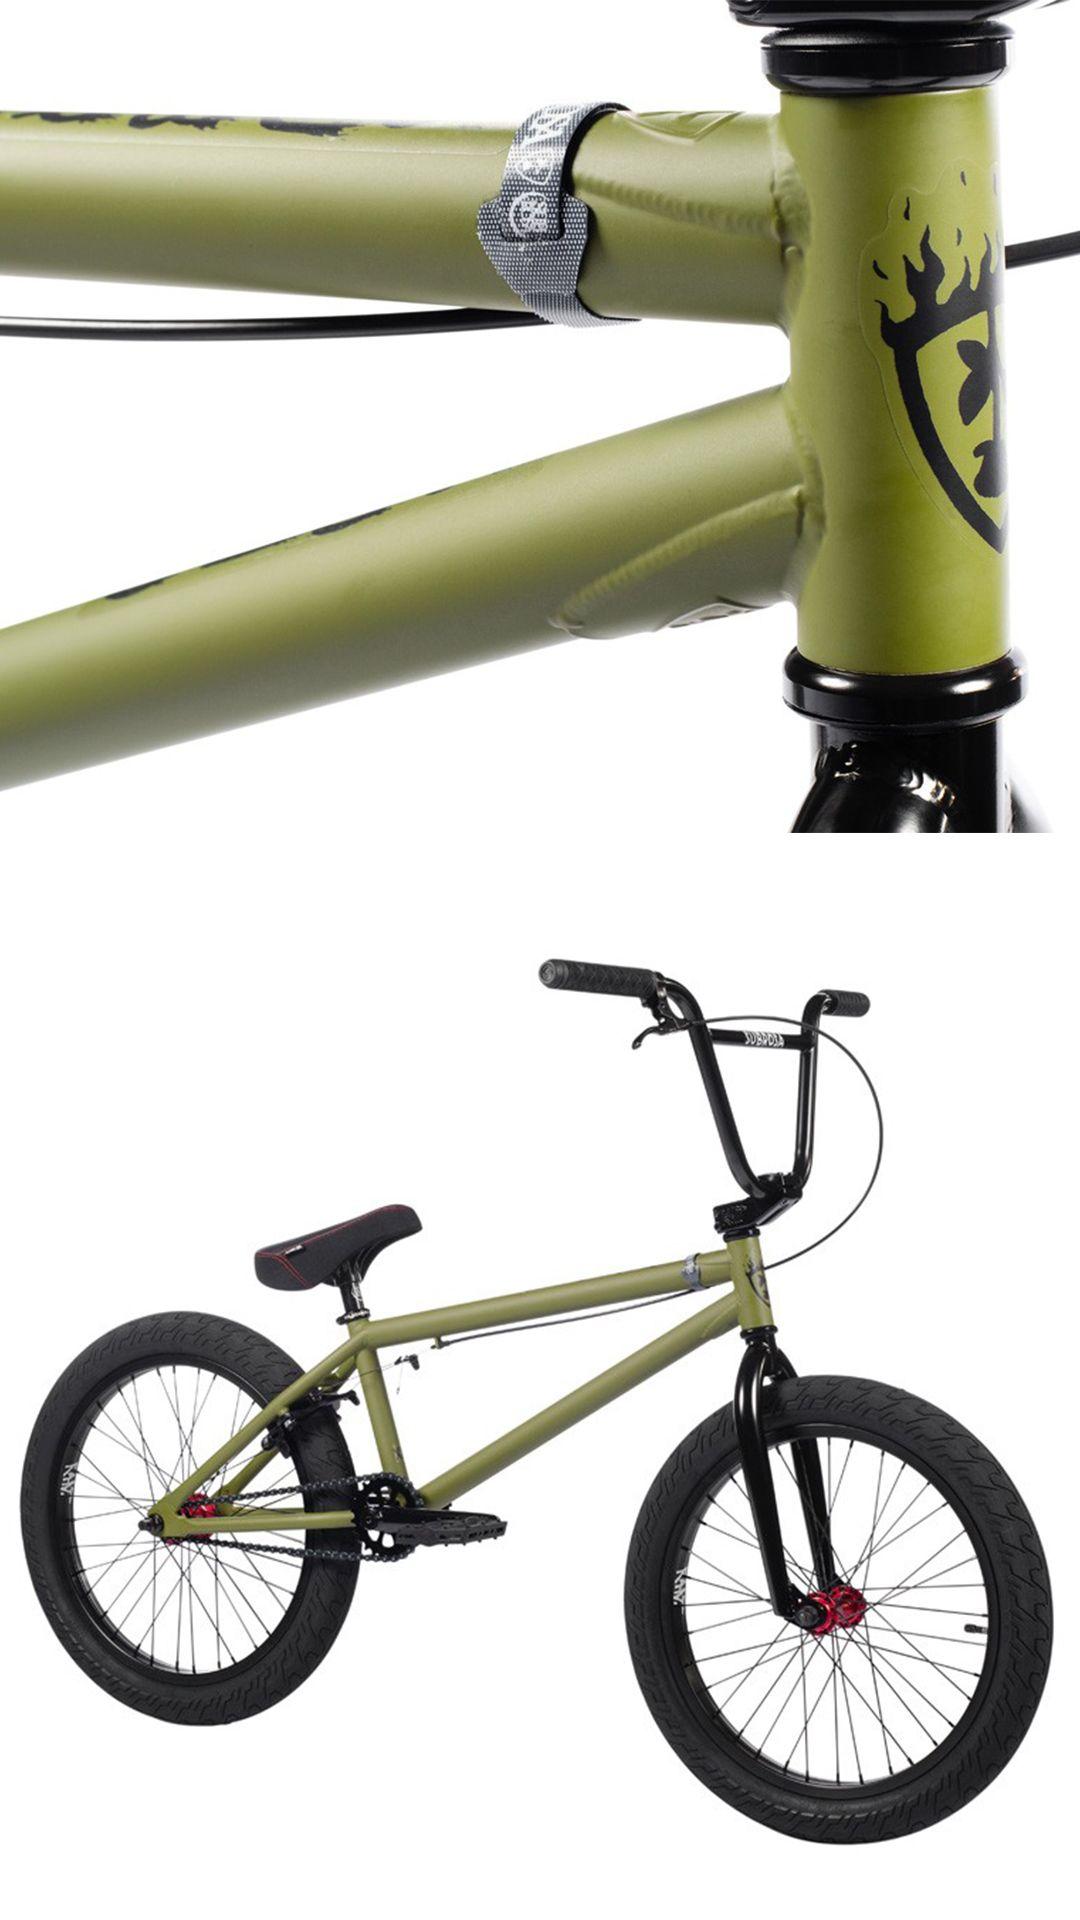 2021 Subrosa Sono Xl Army Green In 2020 Beginner Bike Best Bmx Army Green